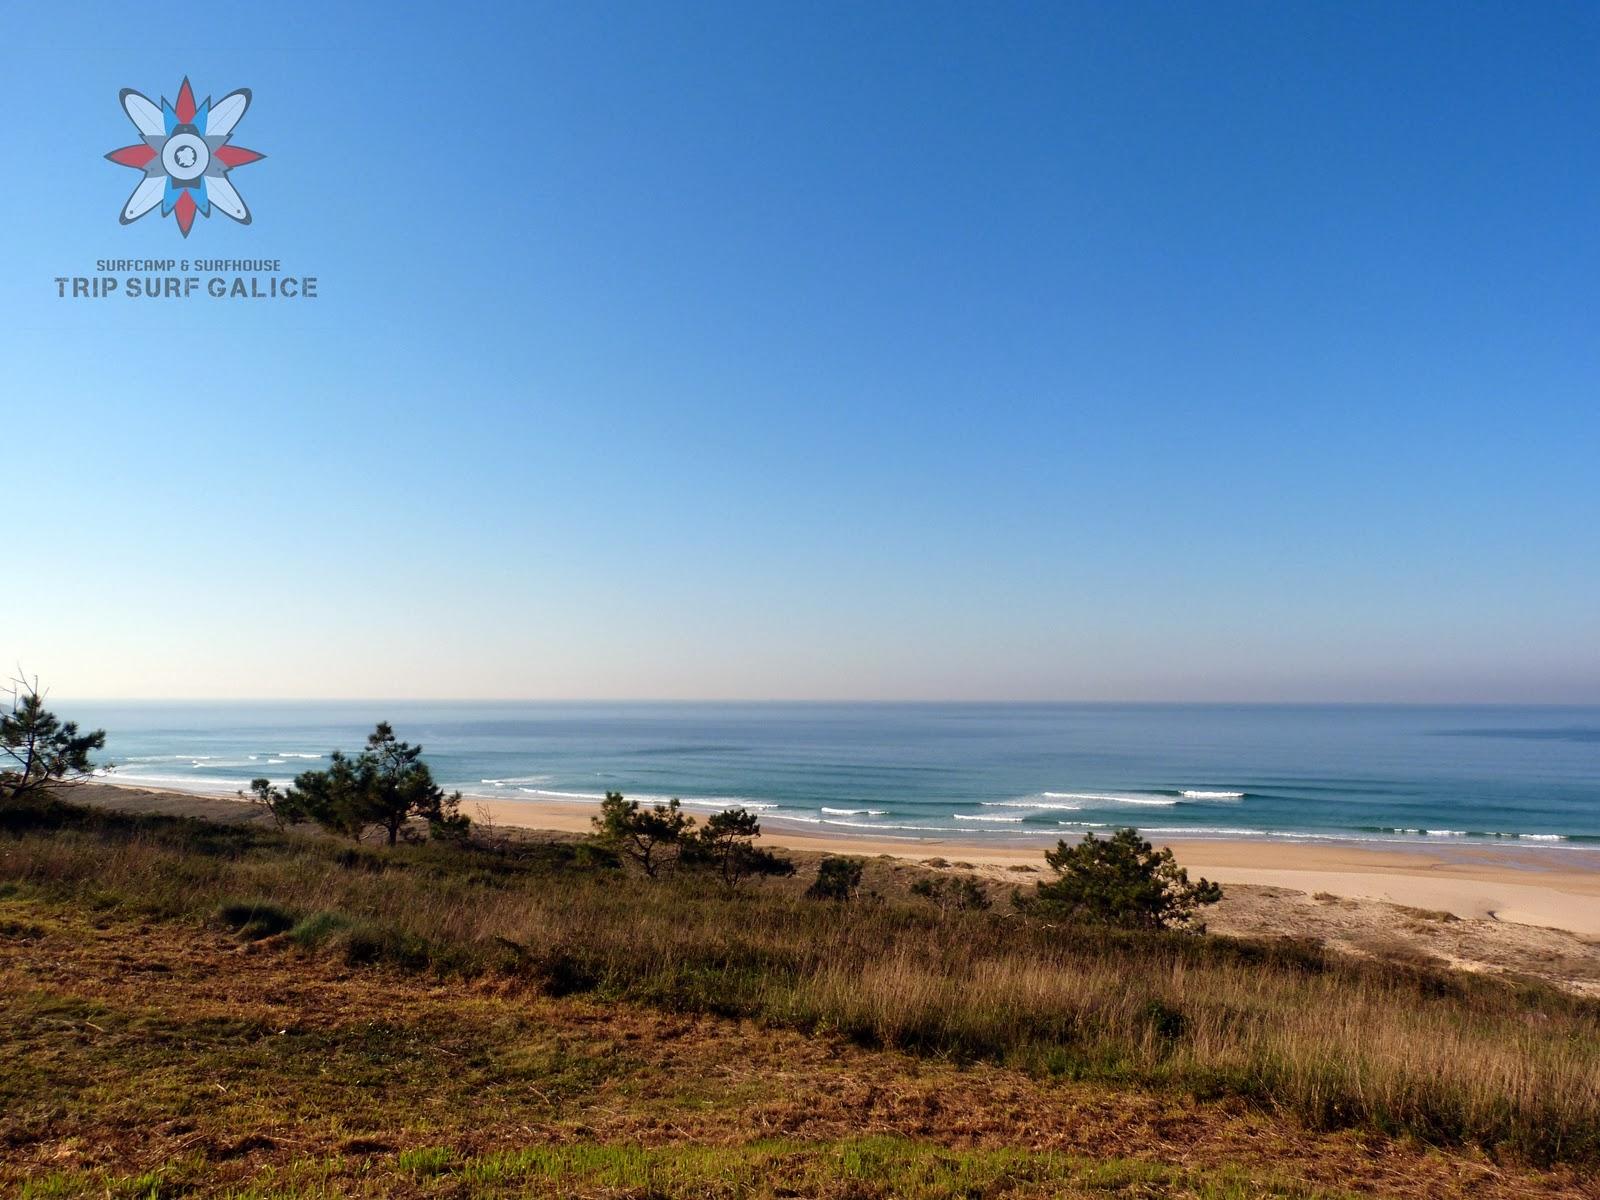 galicia-surf-vague-camp-stage